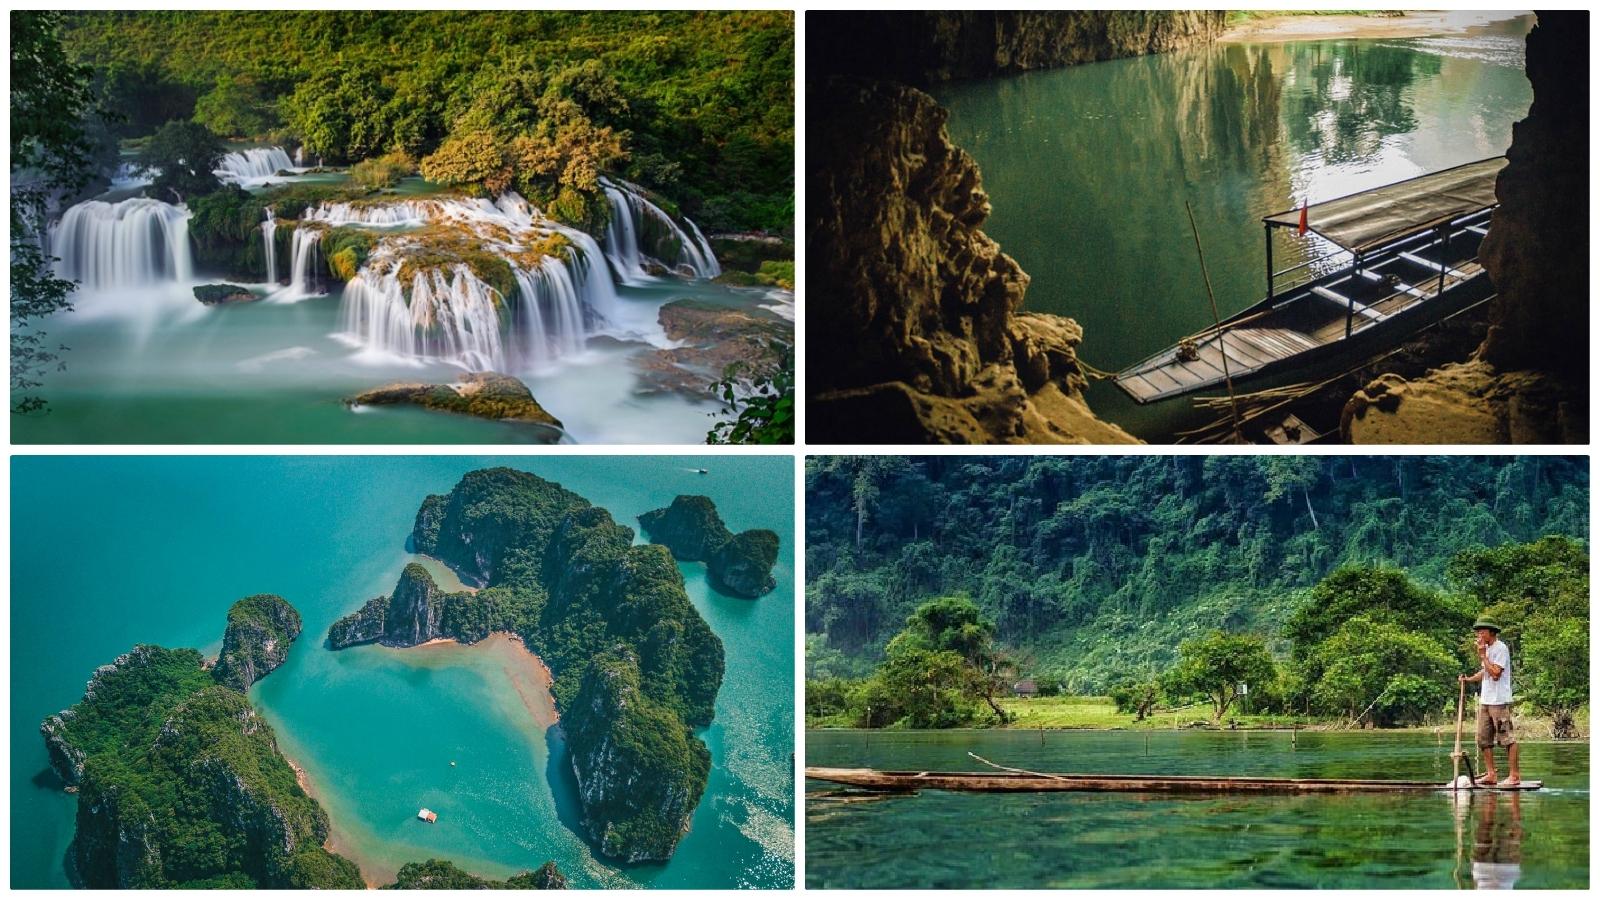 Ban Gioc Waterfall - Be Be Lake - Ha Long Bay